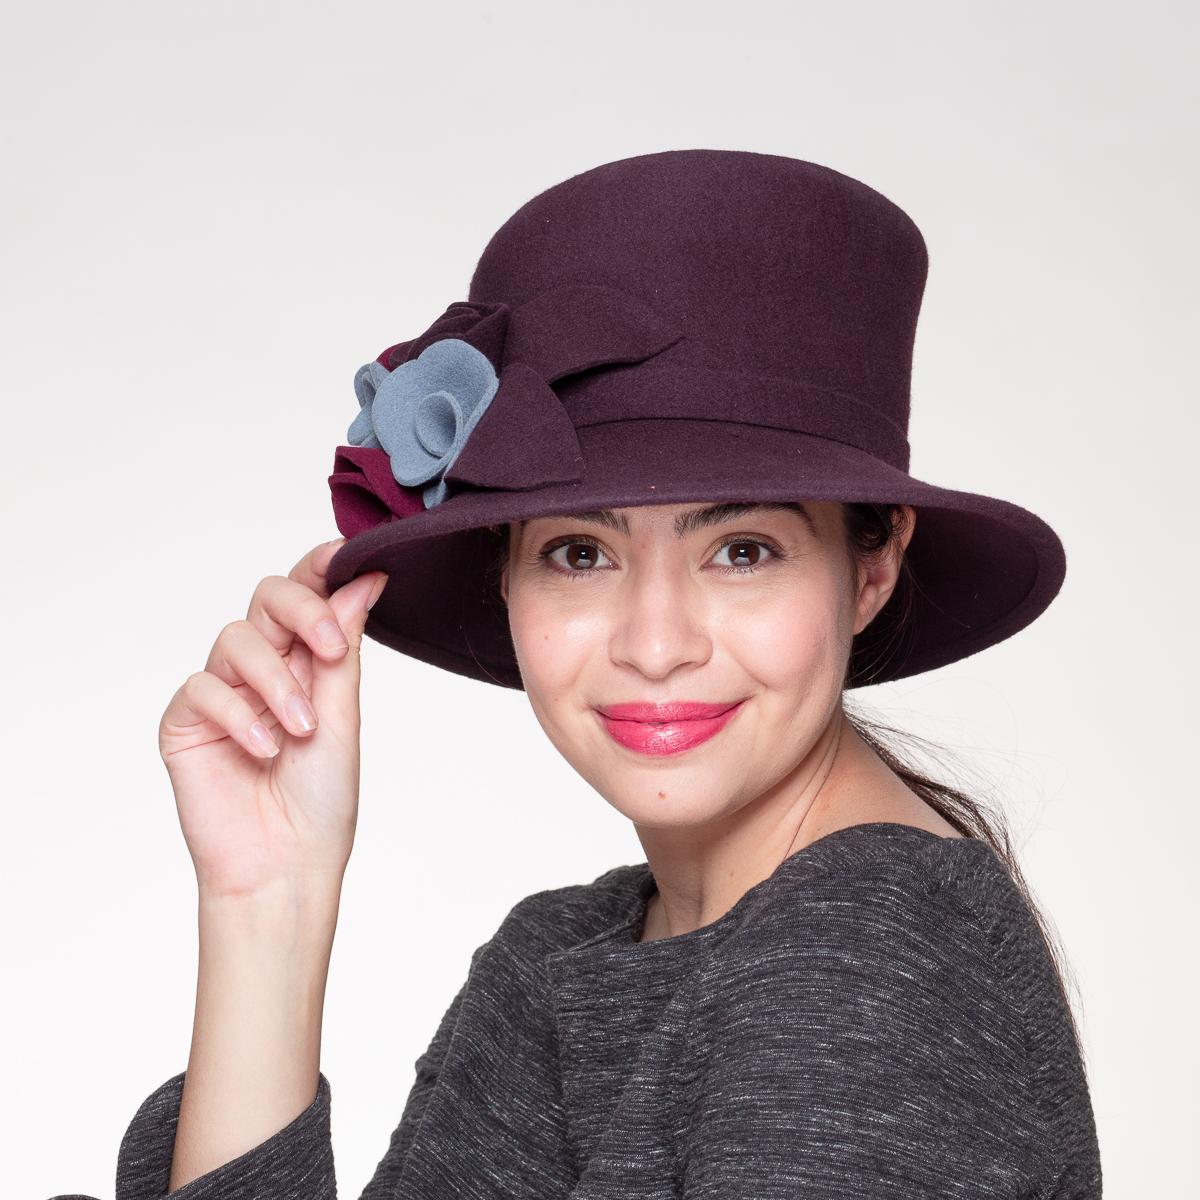 Modena Soft Hat-Asymmetric Crin Felight Bow Hats-466496-D19- Sun Yorkos | KaKyCo Accessories